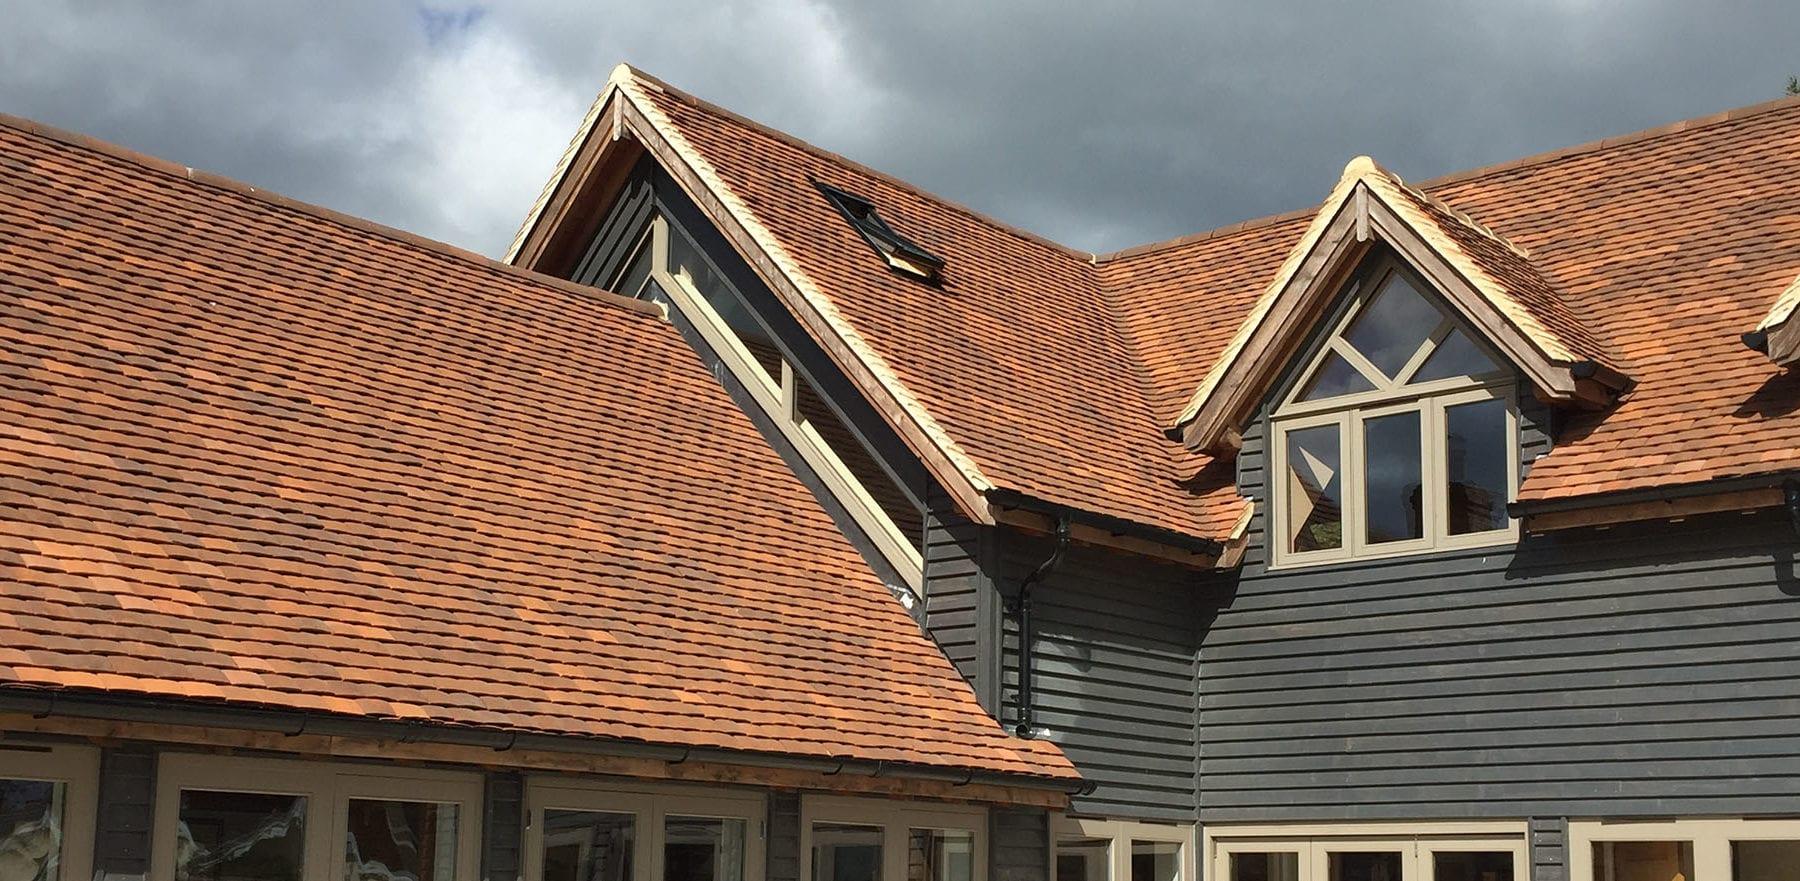 Lifestiles - Handmade Brown Clay Roof Tiles - Midgham, England 4